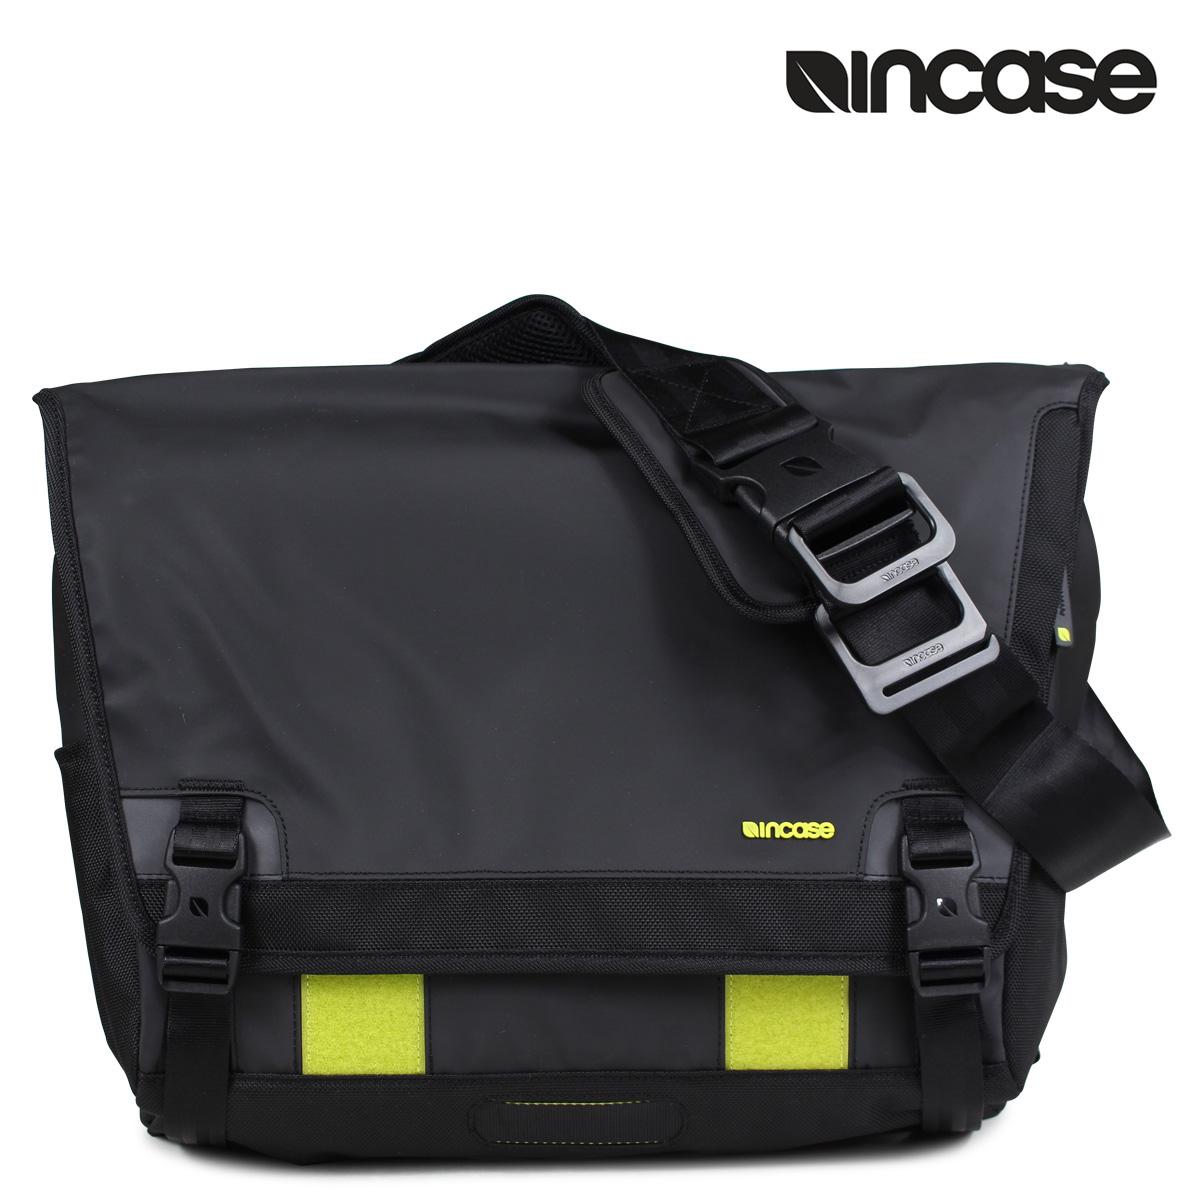 9f043a0da3da Incase chrome slider INCASE Messenger back shoulder bags mens 2015 stock  CL55539 black RANGE MESSENGER BAG FOR 15